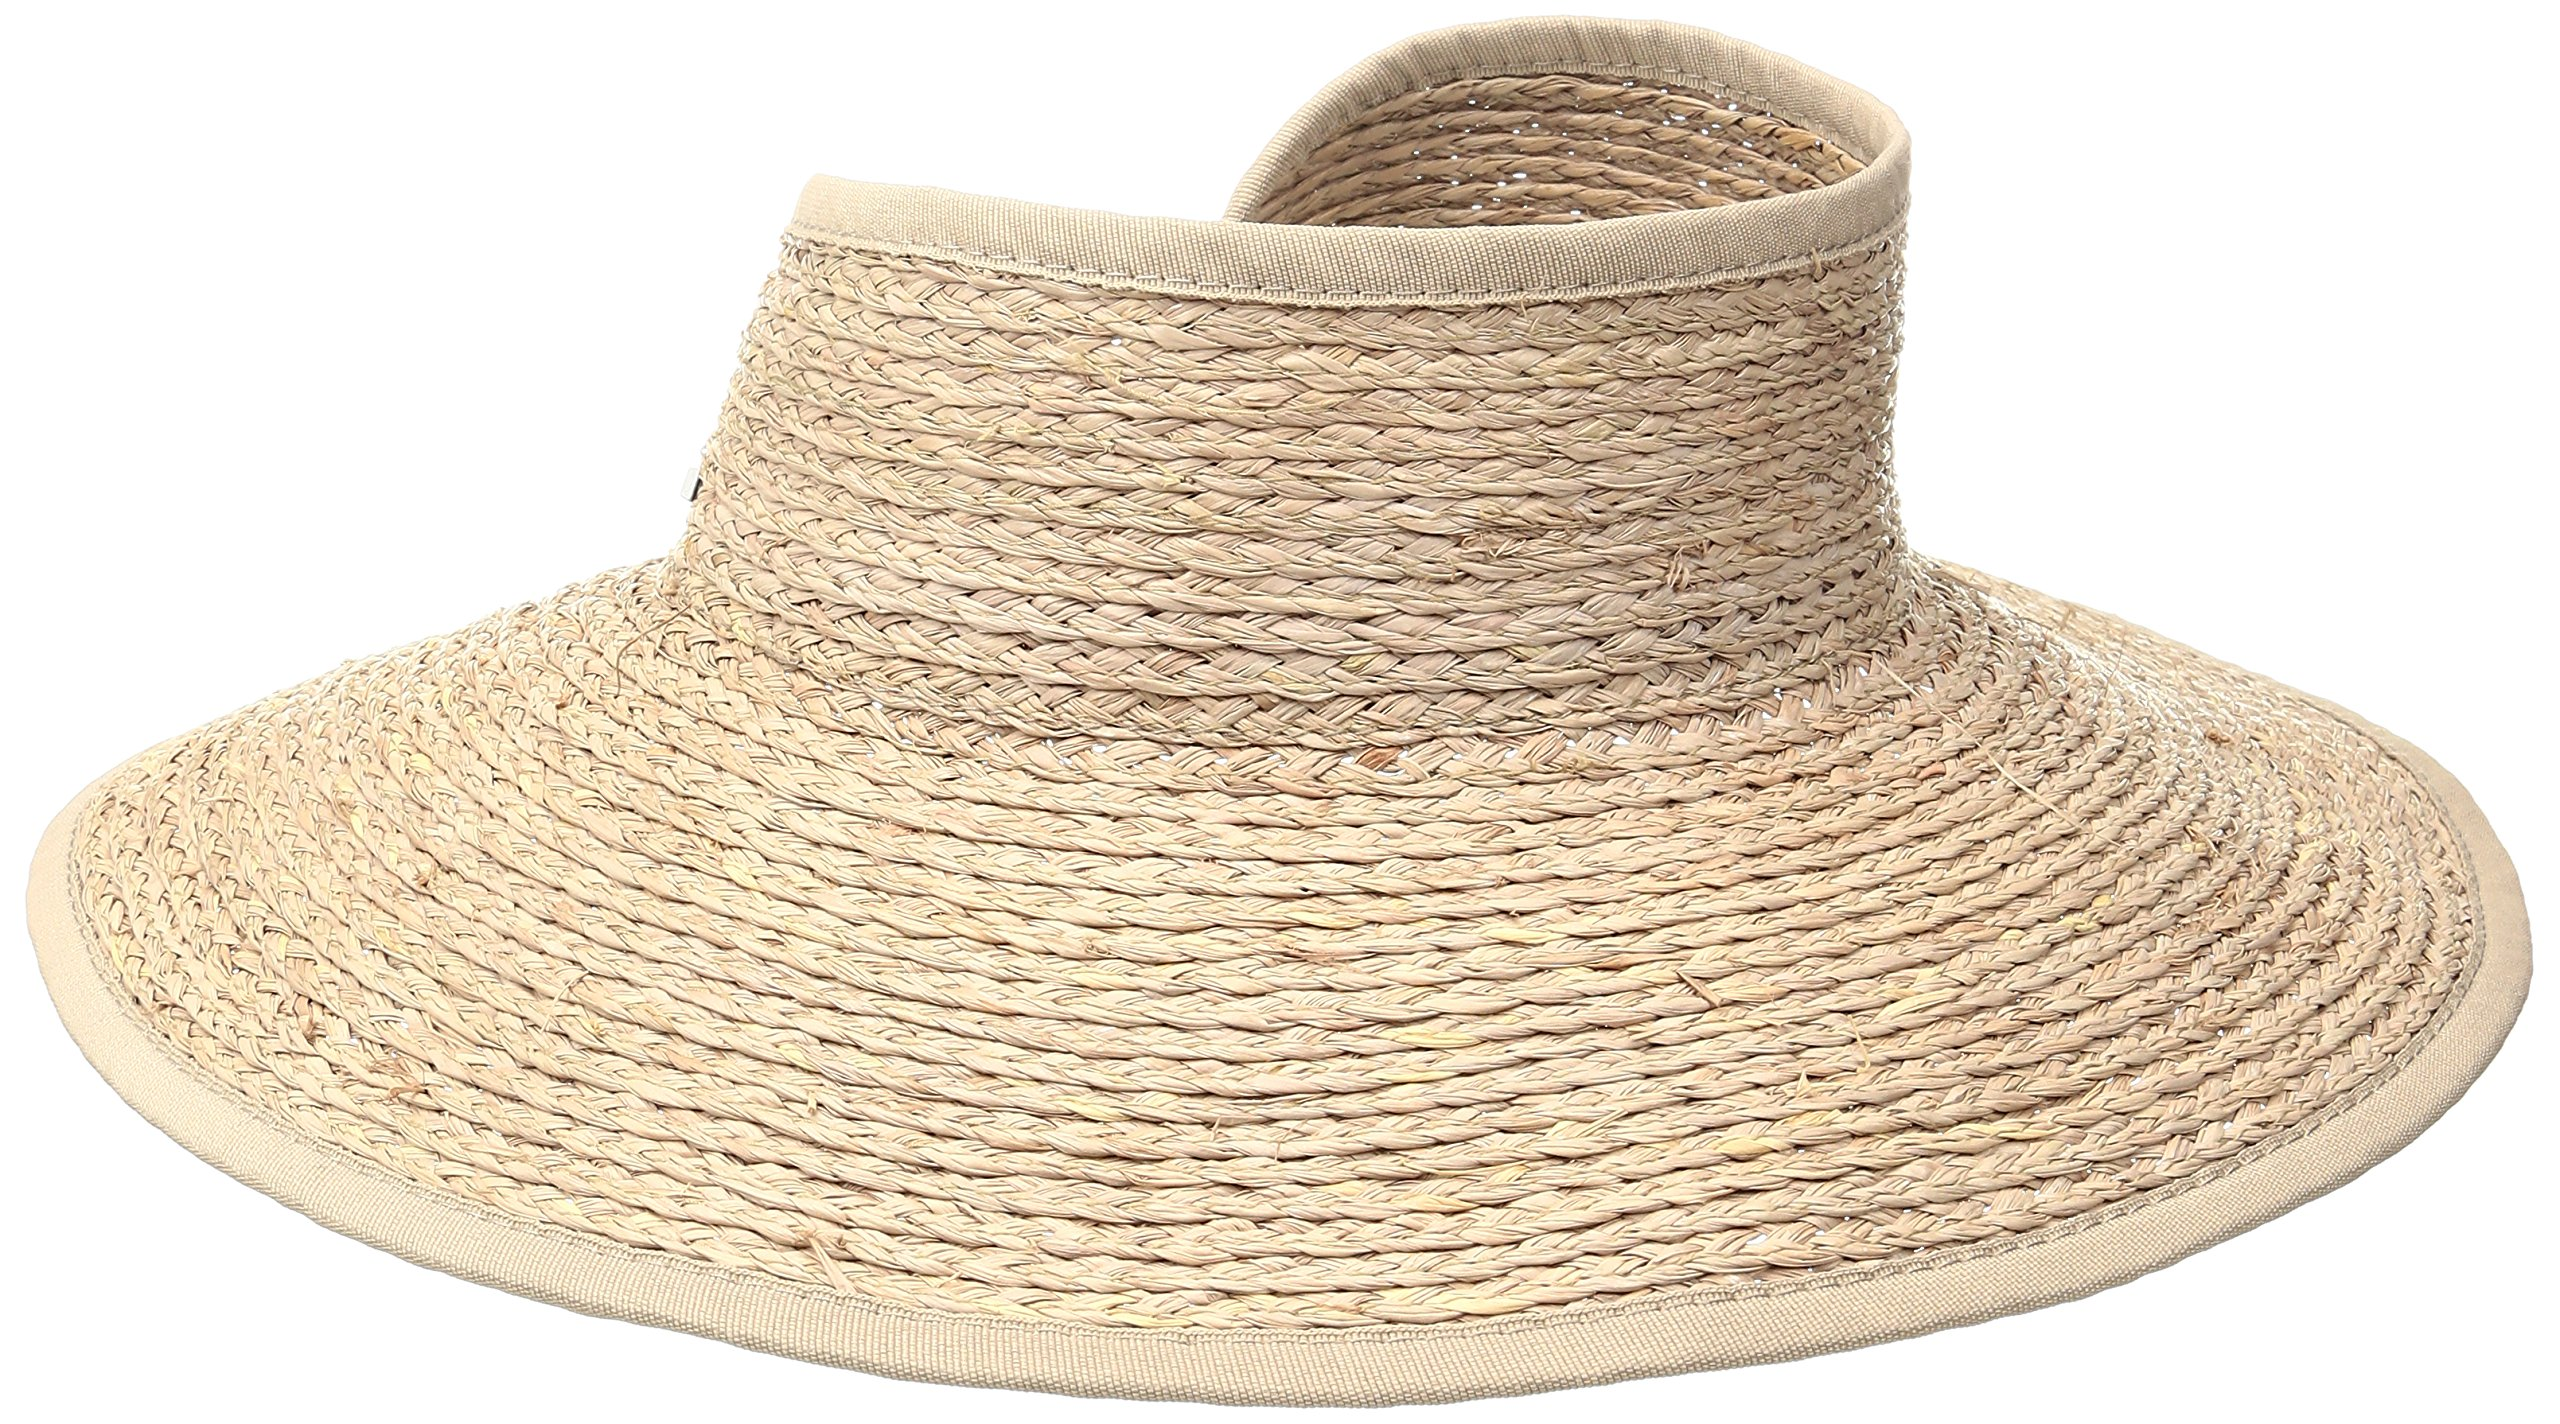 San Diego Hat Company Women's Raffia Roll Up Visor Hat, Nougat, OS by San Diego Hat Company